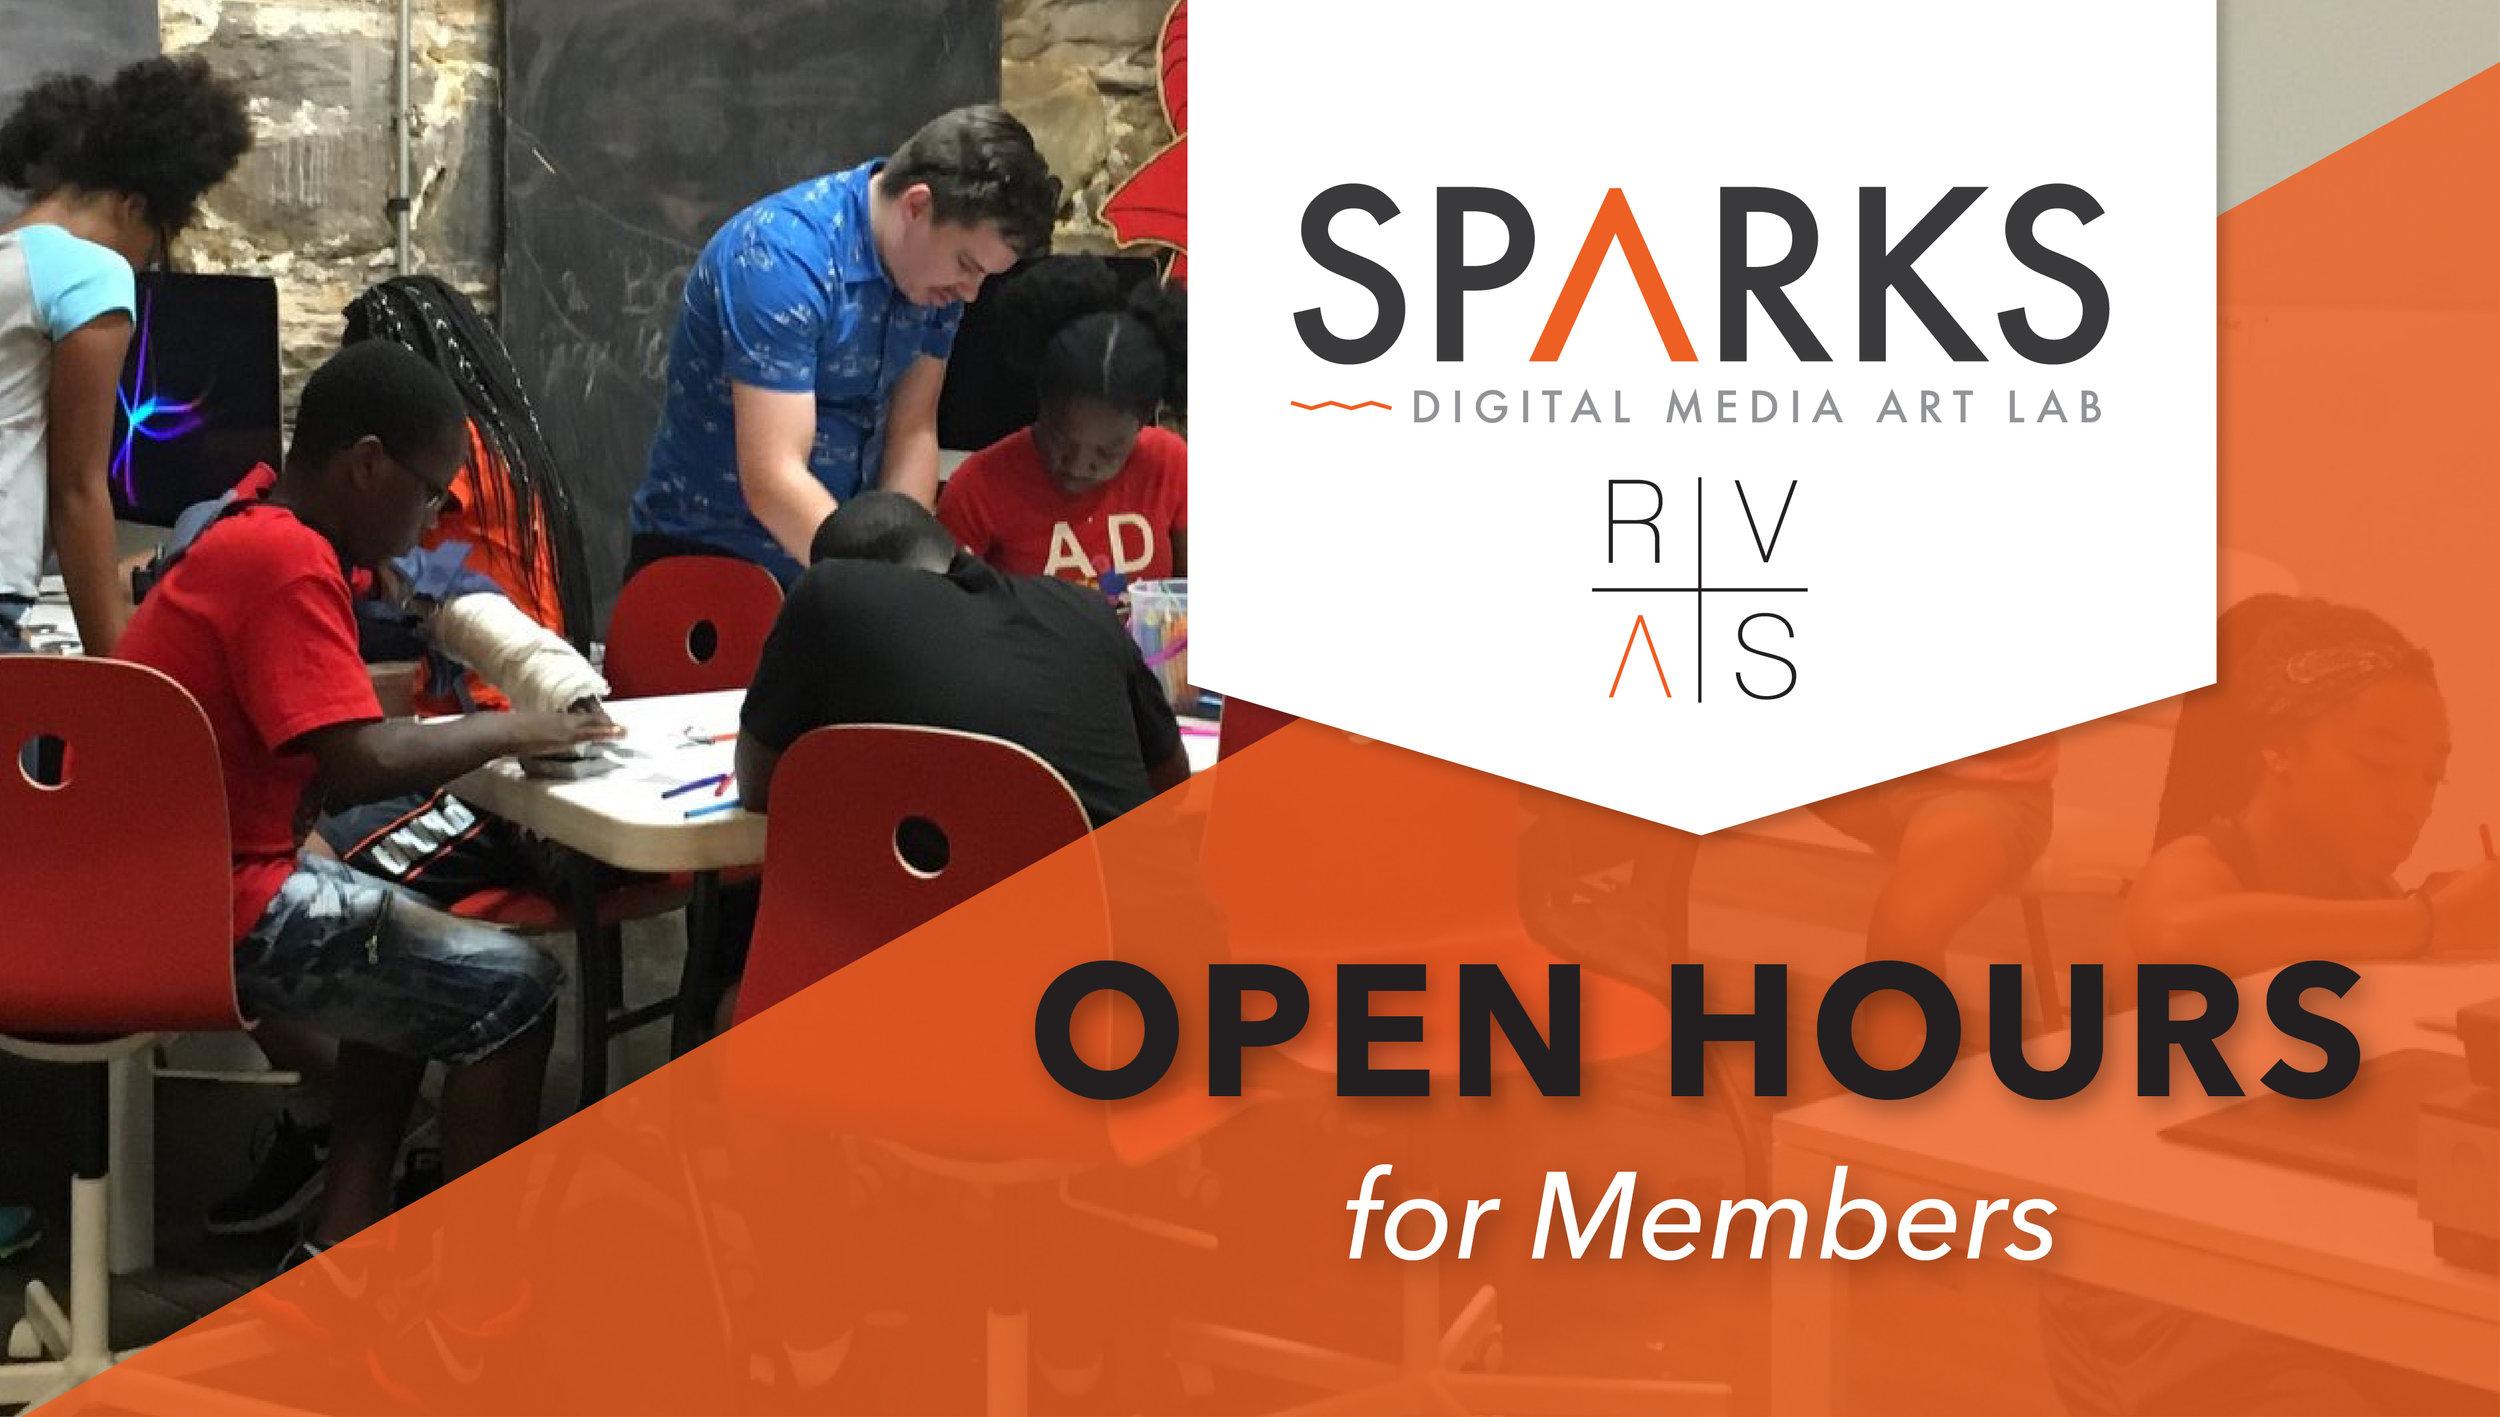 Sparks_OpenHours_Image-01.jpg